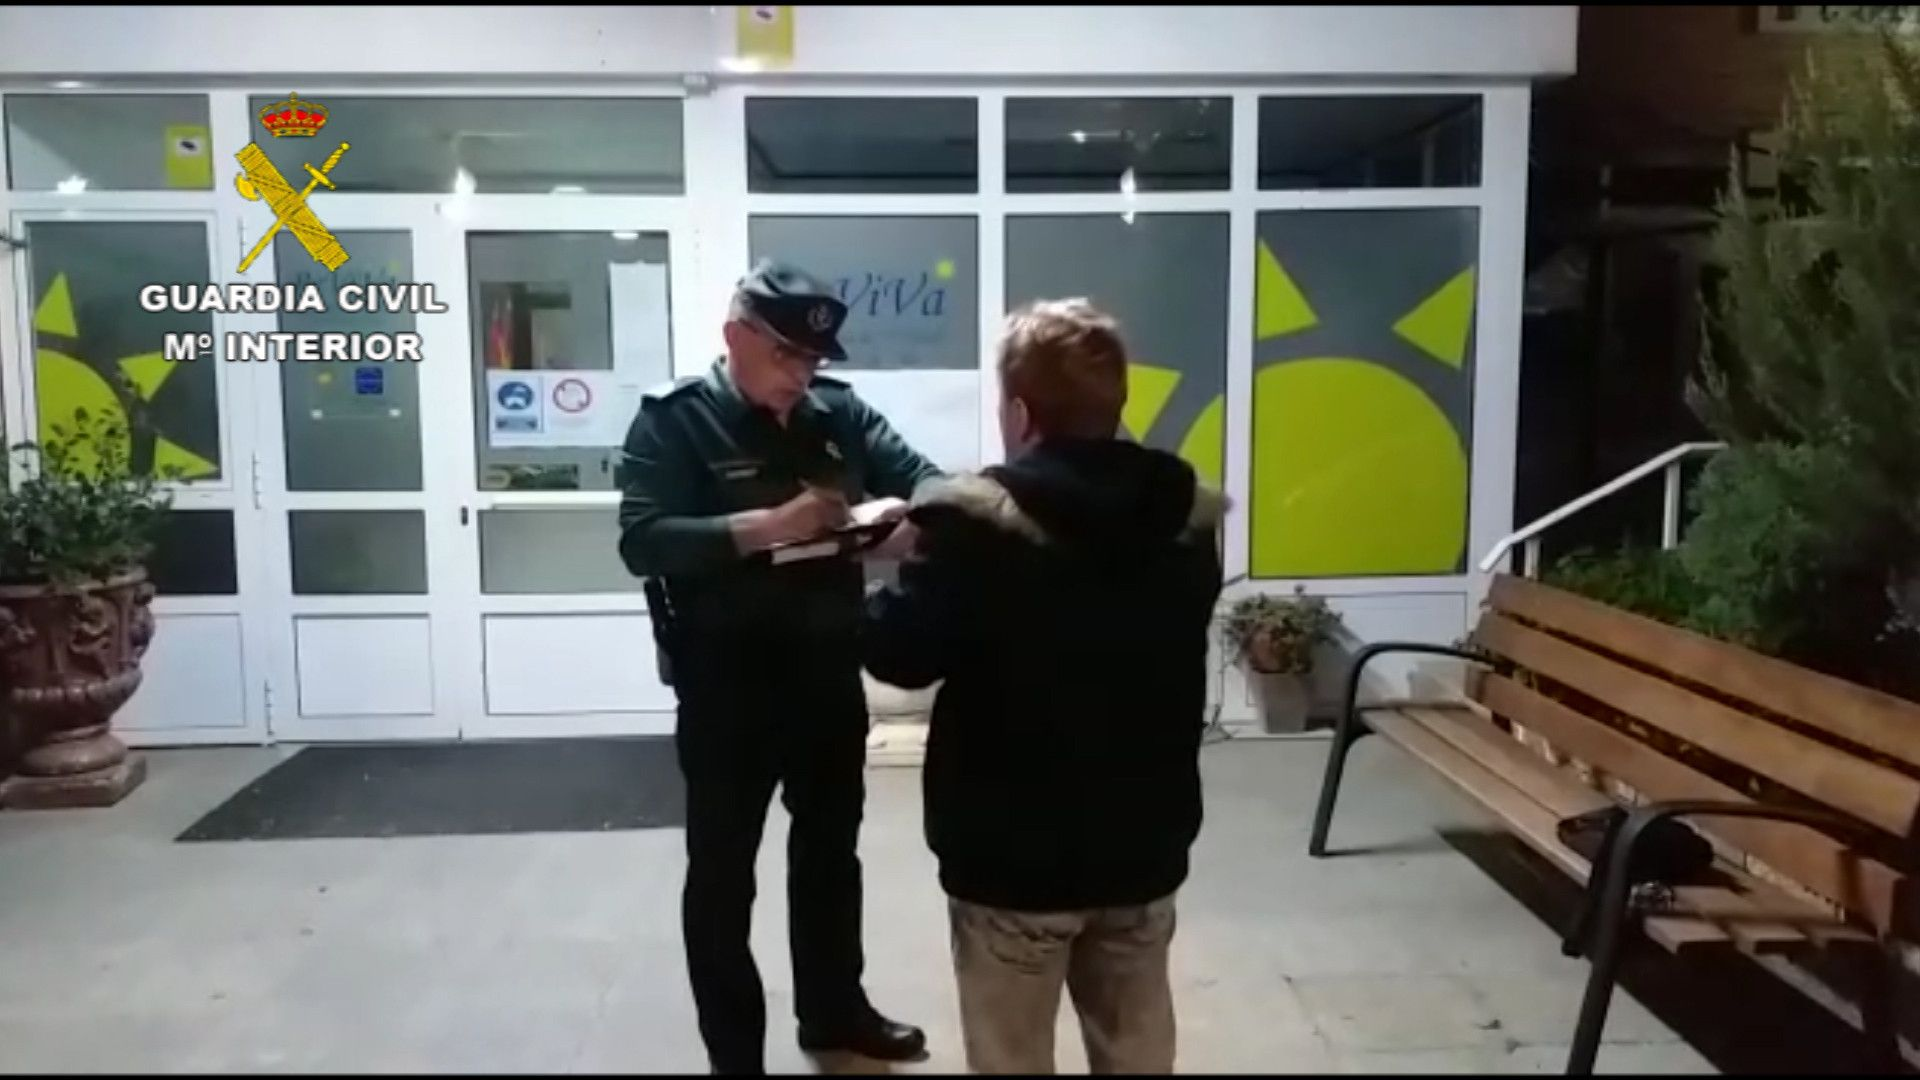 Guardia civil 2